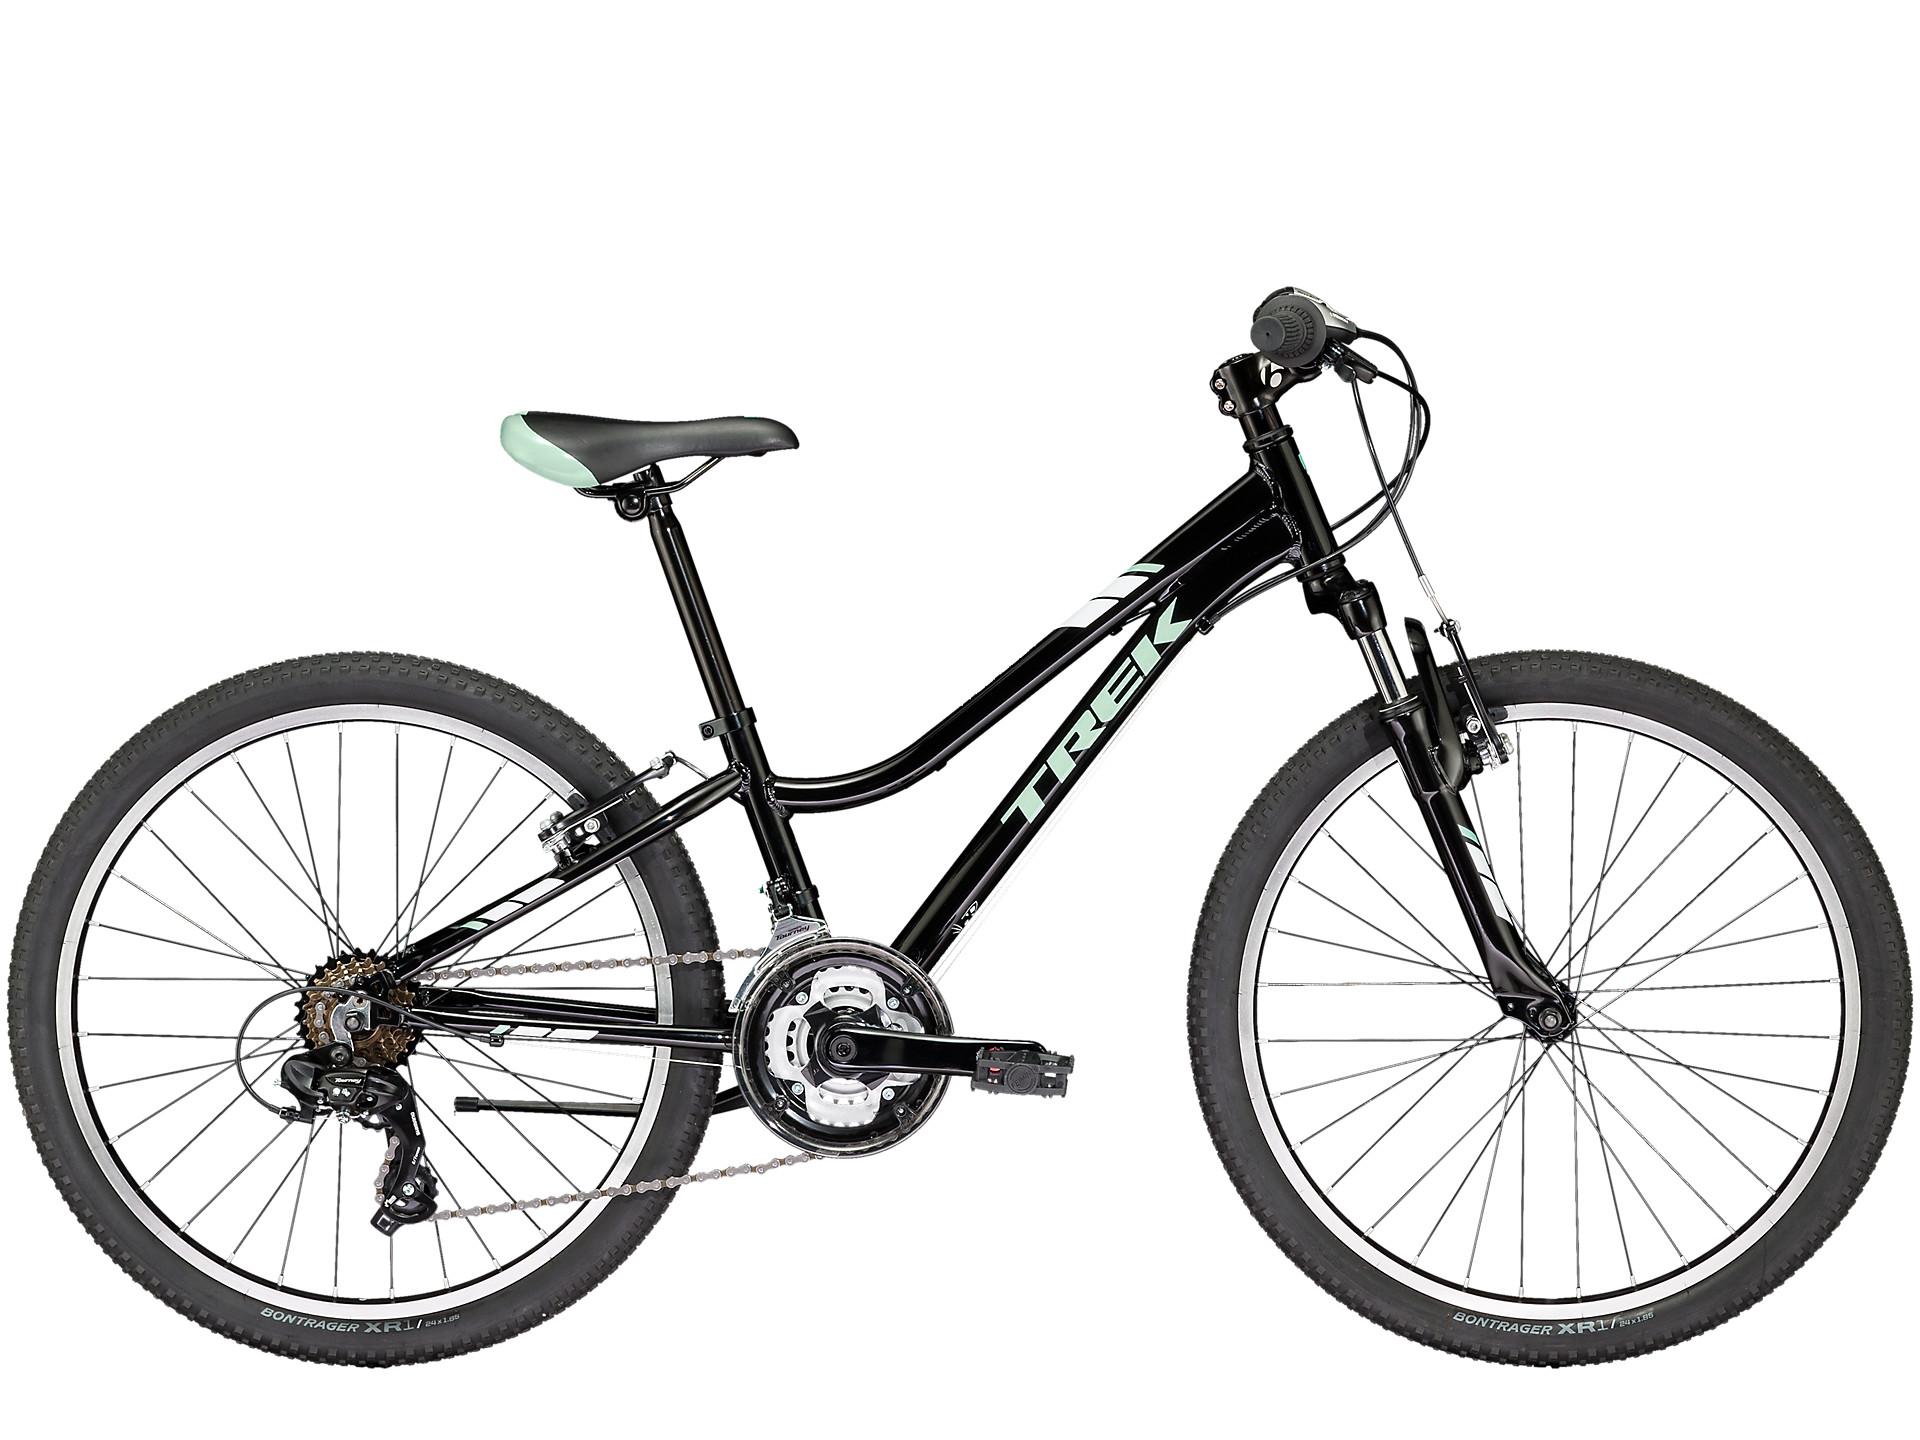 5753a0e9b3a Precaliber 24 21-speed Girl's   Trek Bikes